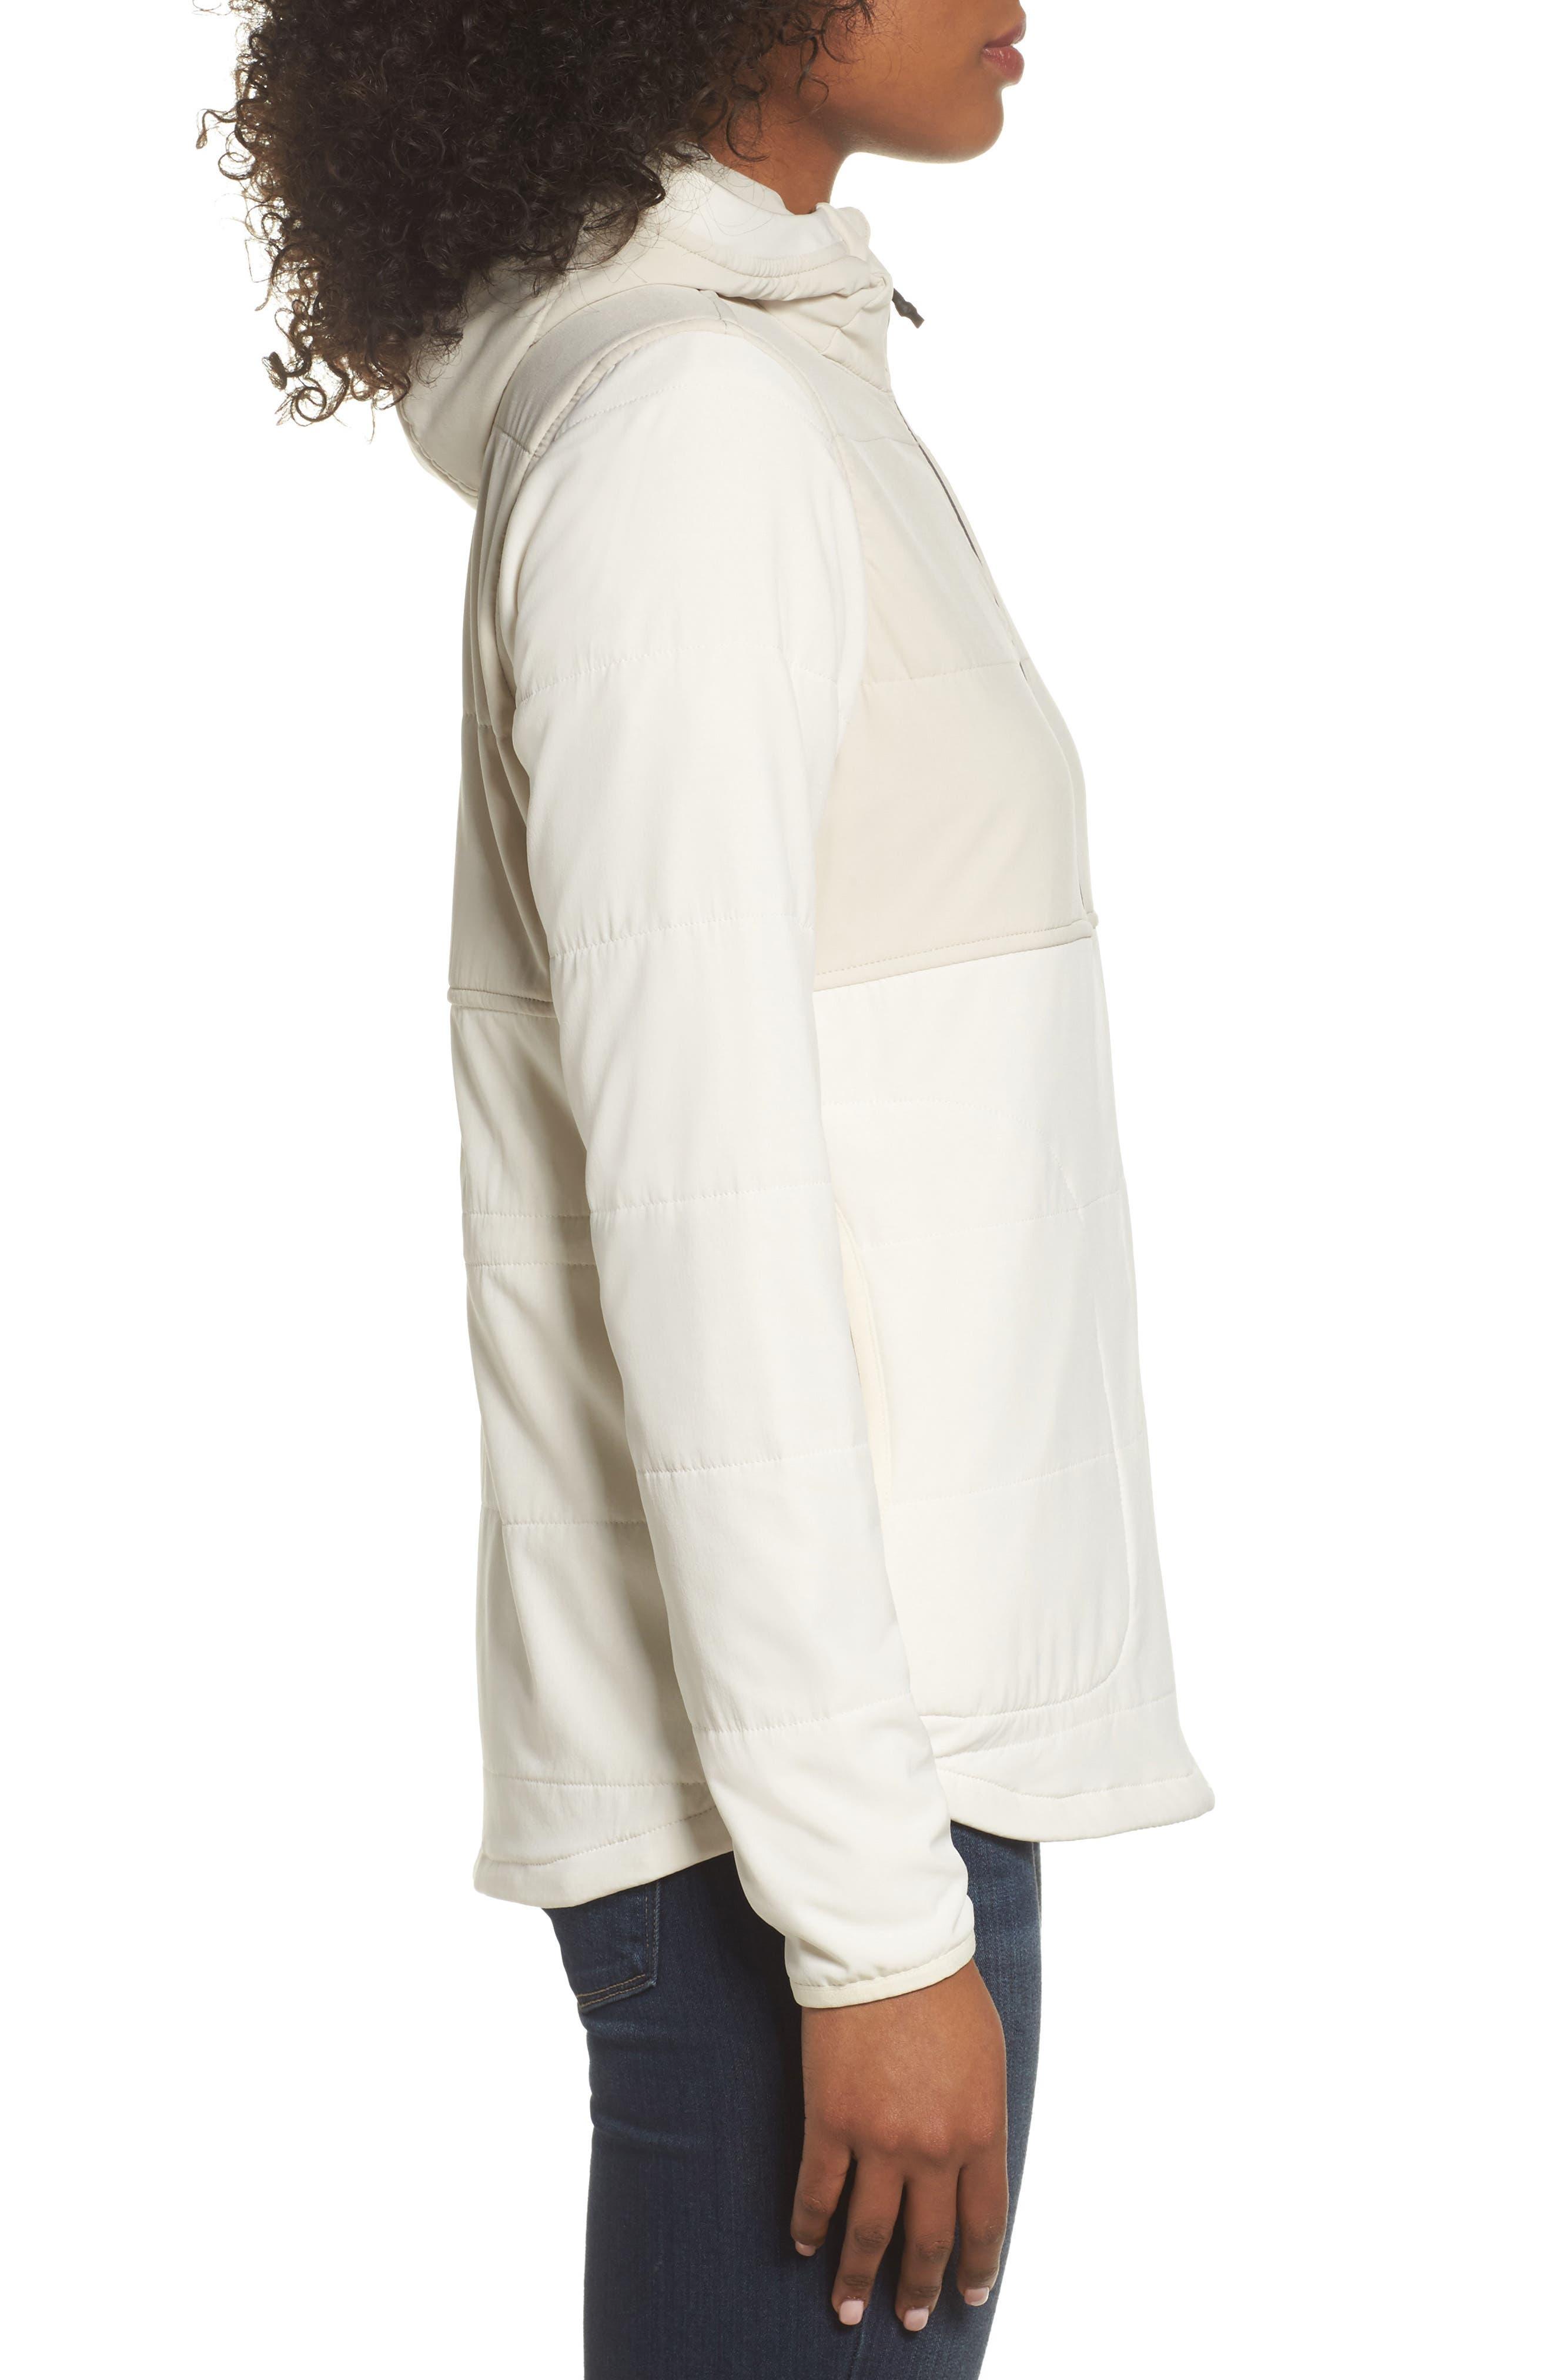 Mountain Sweatshirt Insulated Hooded Jacket,                             Alternate thumbnail 3, color,                             100